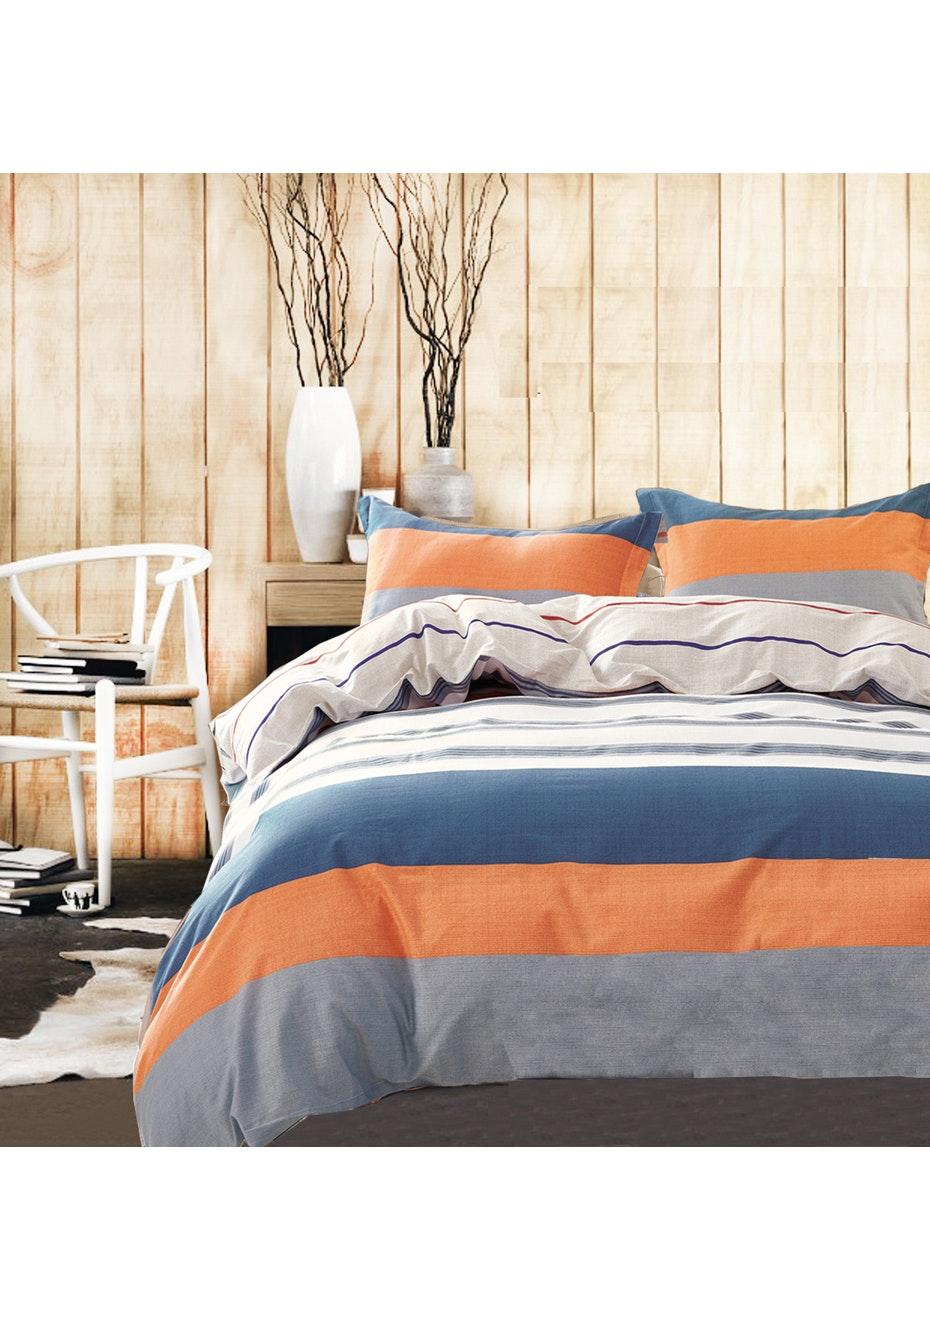 Nelson Bay Quilt Cover Set - Reversible Design - 100% Cotton - Double Bed